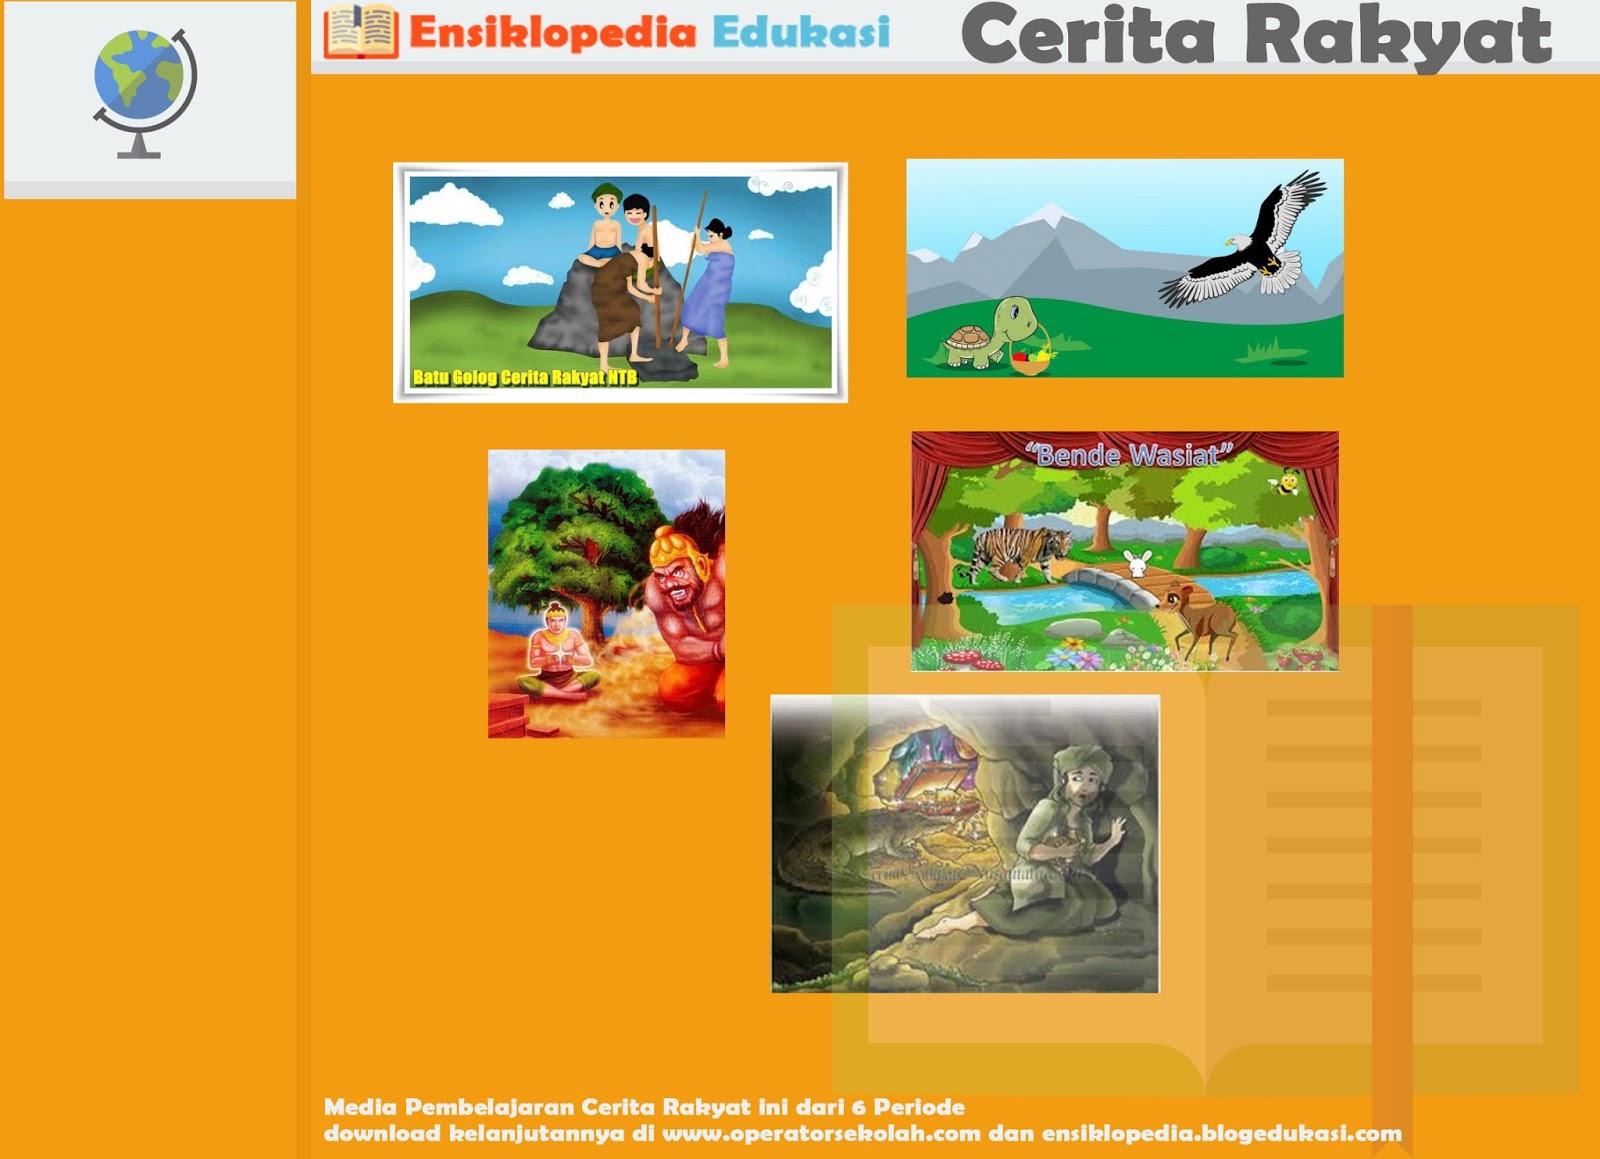 Media Pembelajaran Cerita Rakyat Periode II Terbuat dari PowerPoint (5 Judul)